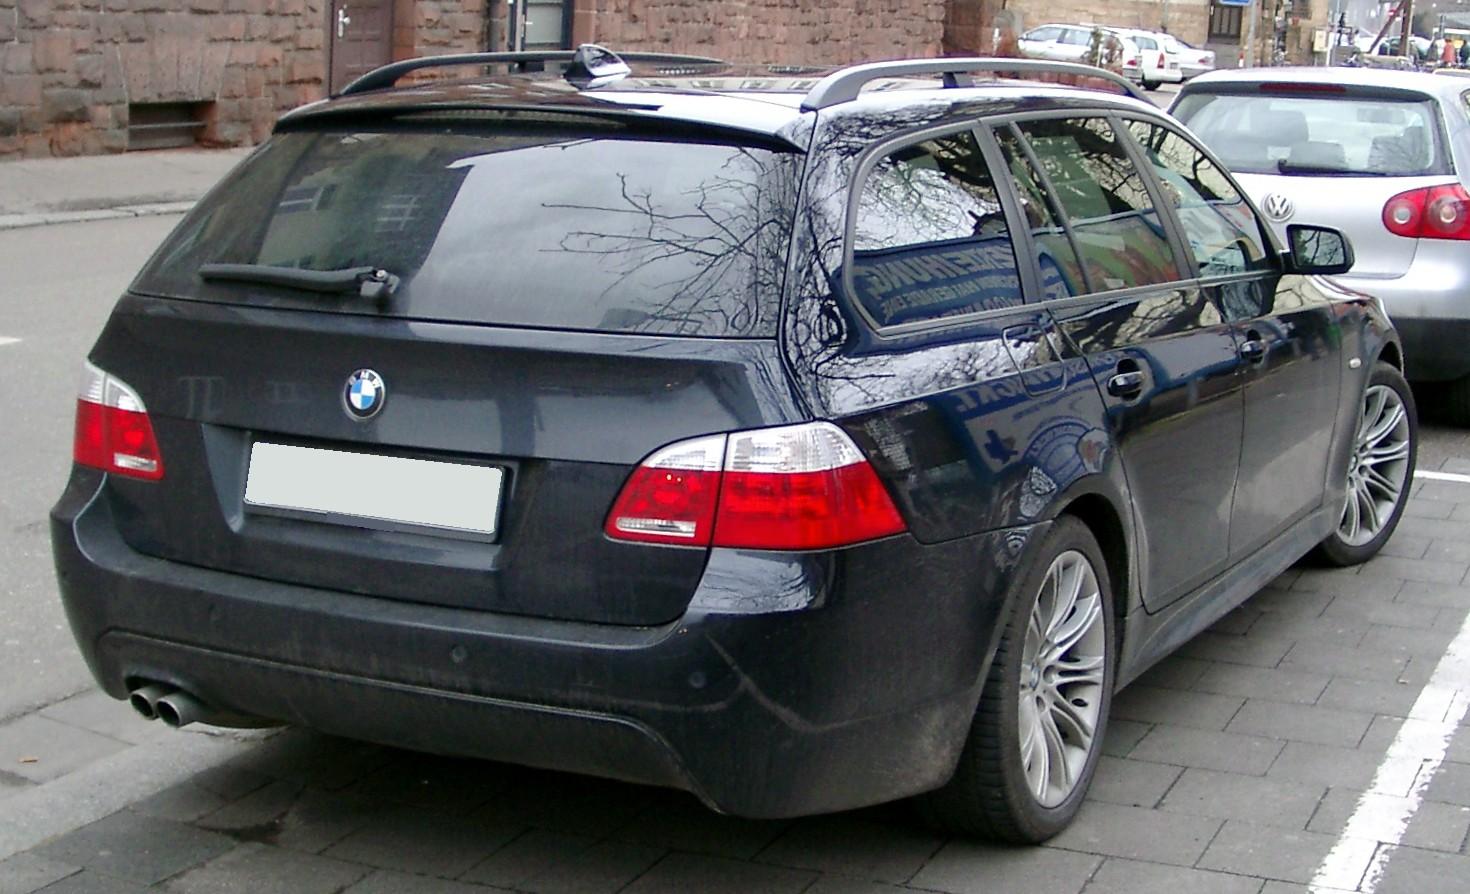 File:BMW E61 rear 20080118.jpg - Wikimedia Commons